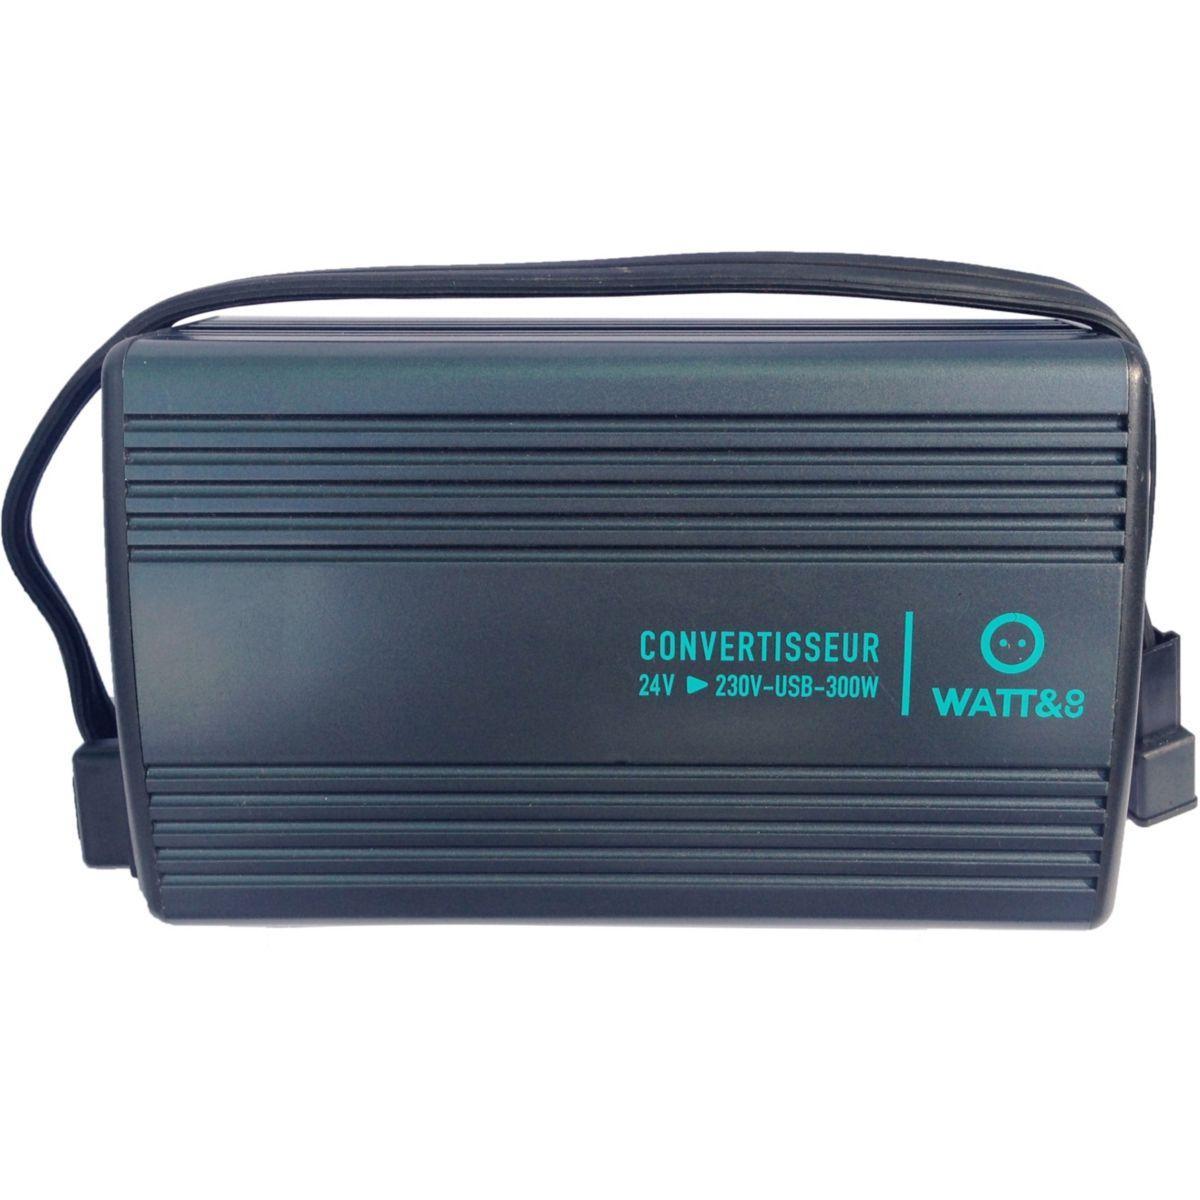 Convertisseur watt and co convertisseur24v-230v 300w1xusb 2a - 7% de remise imm�diate avec le code : fete7